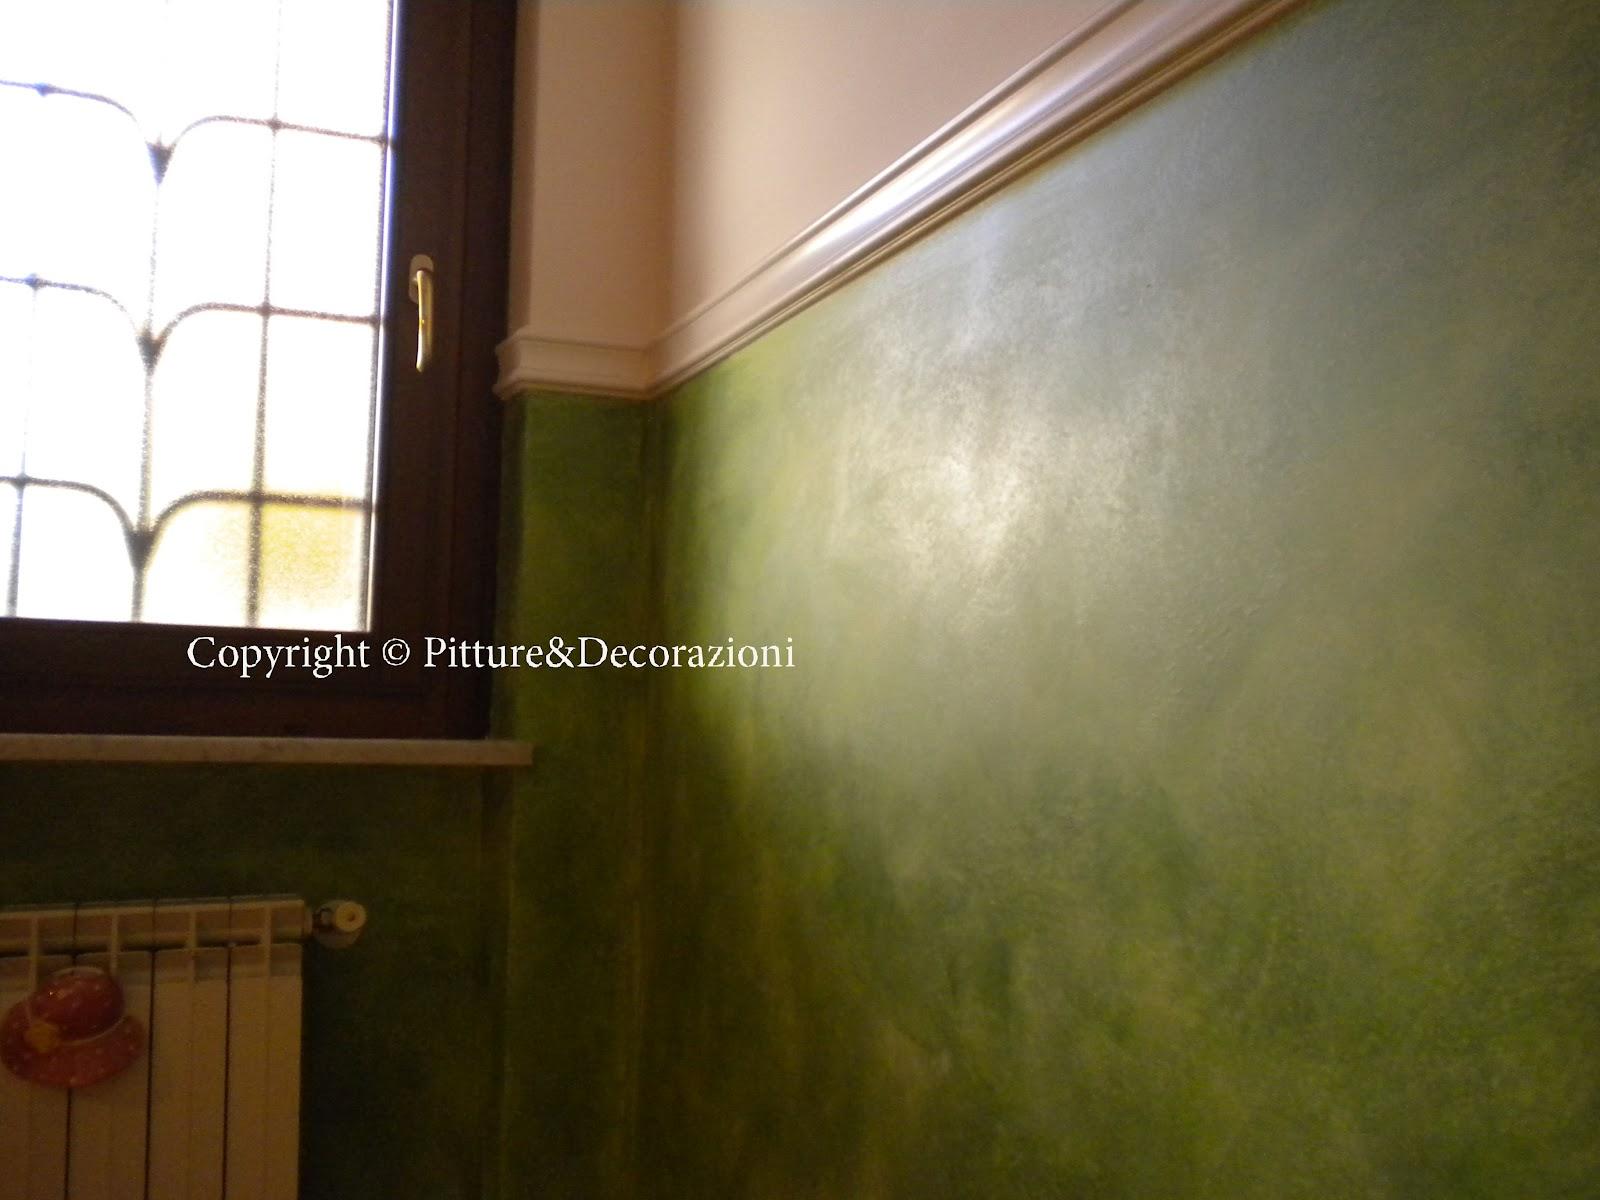 Pitture decorazioni cucina con cebotrend - Colori pittura cucina ...